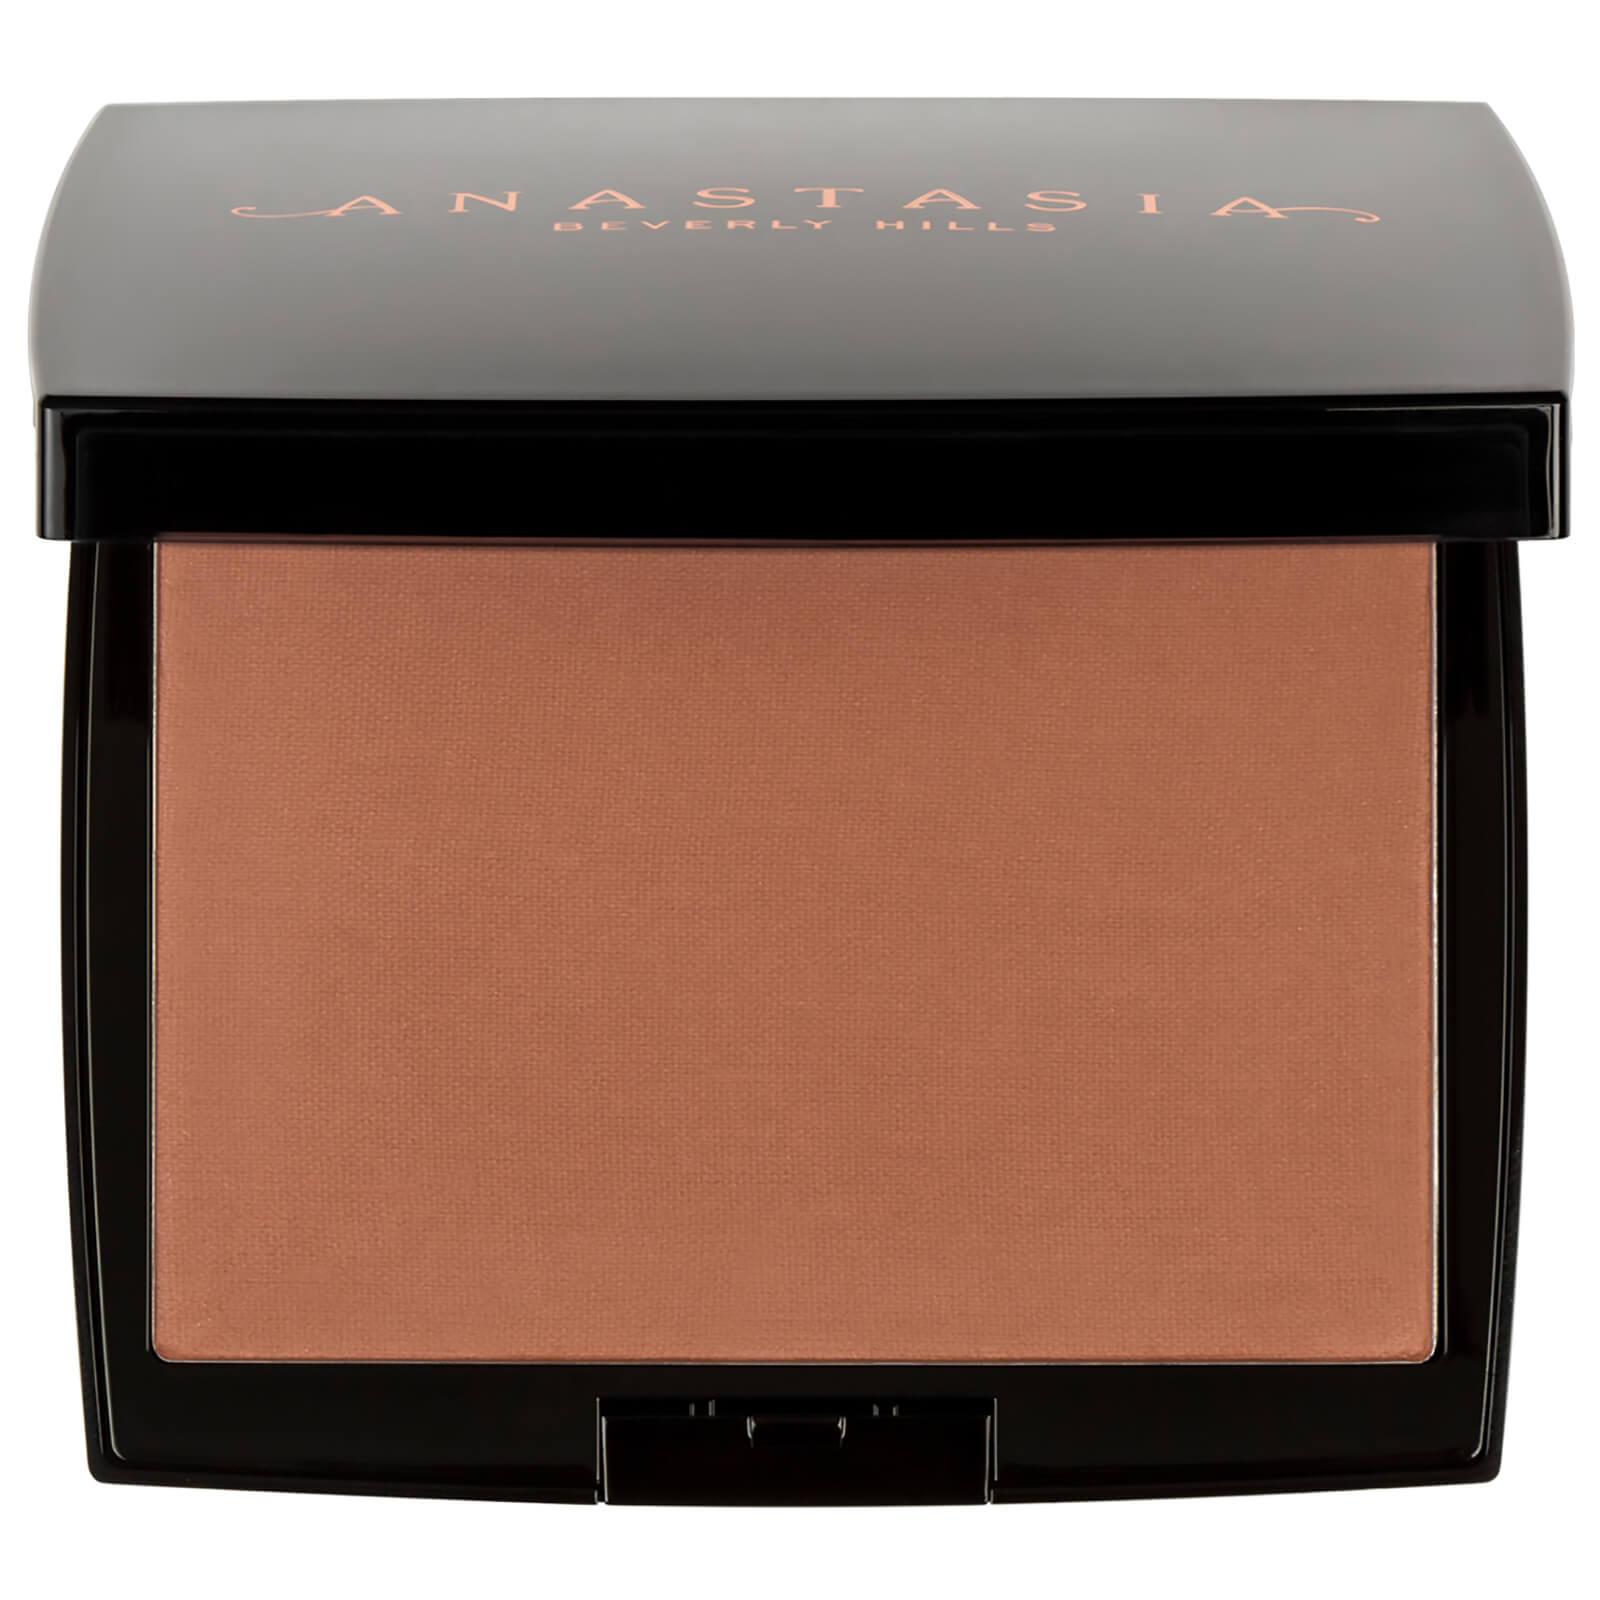 Anastasia Beverly Hills Powder Bronzer 10g (Various Shades) - Cappucino